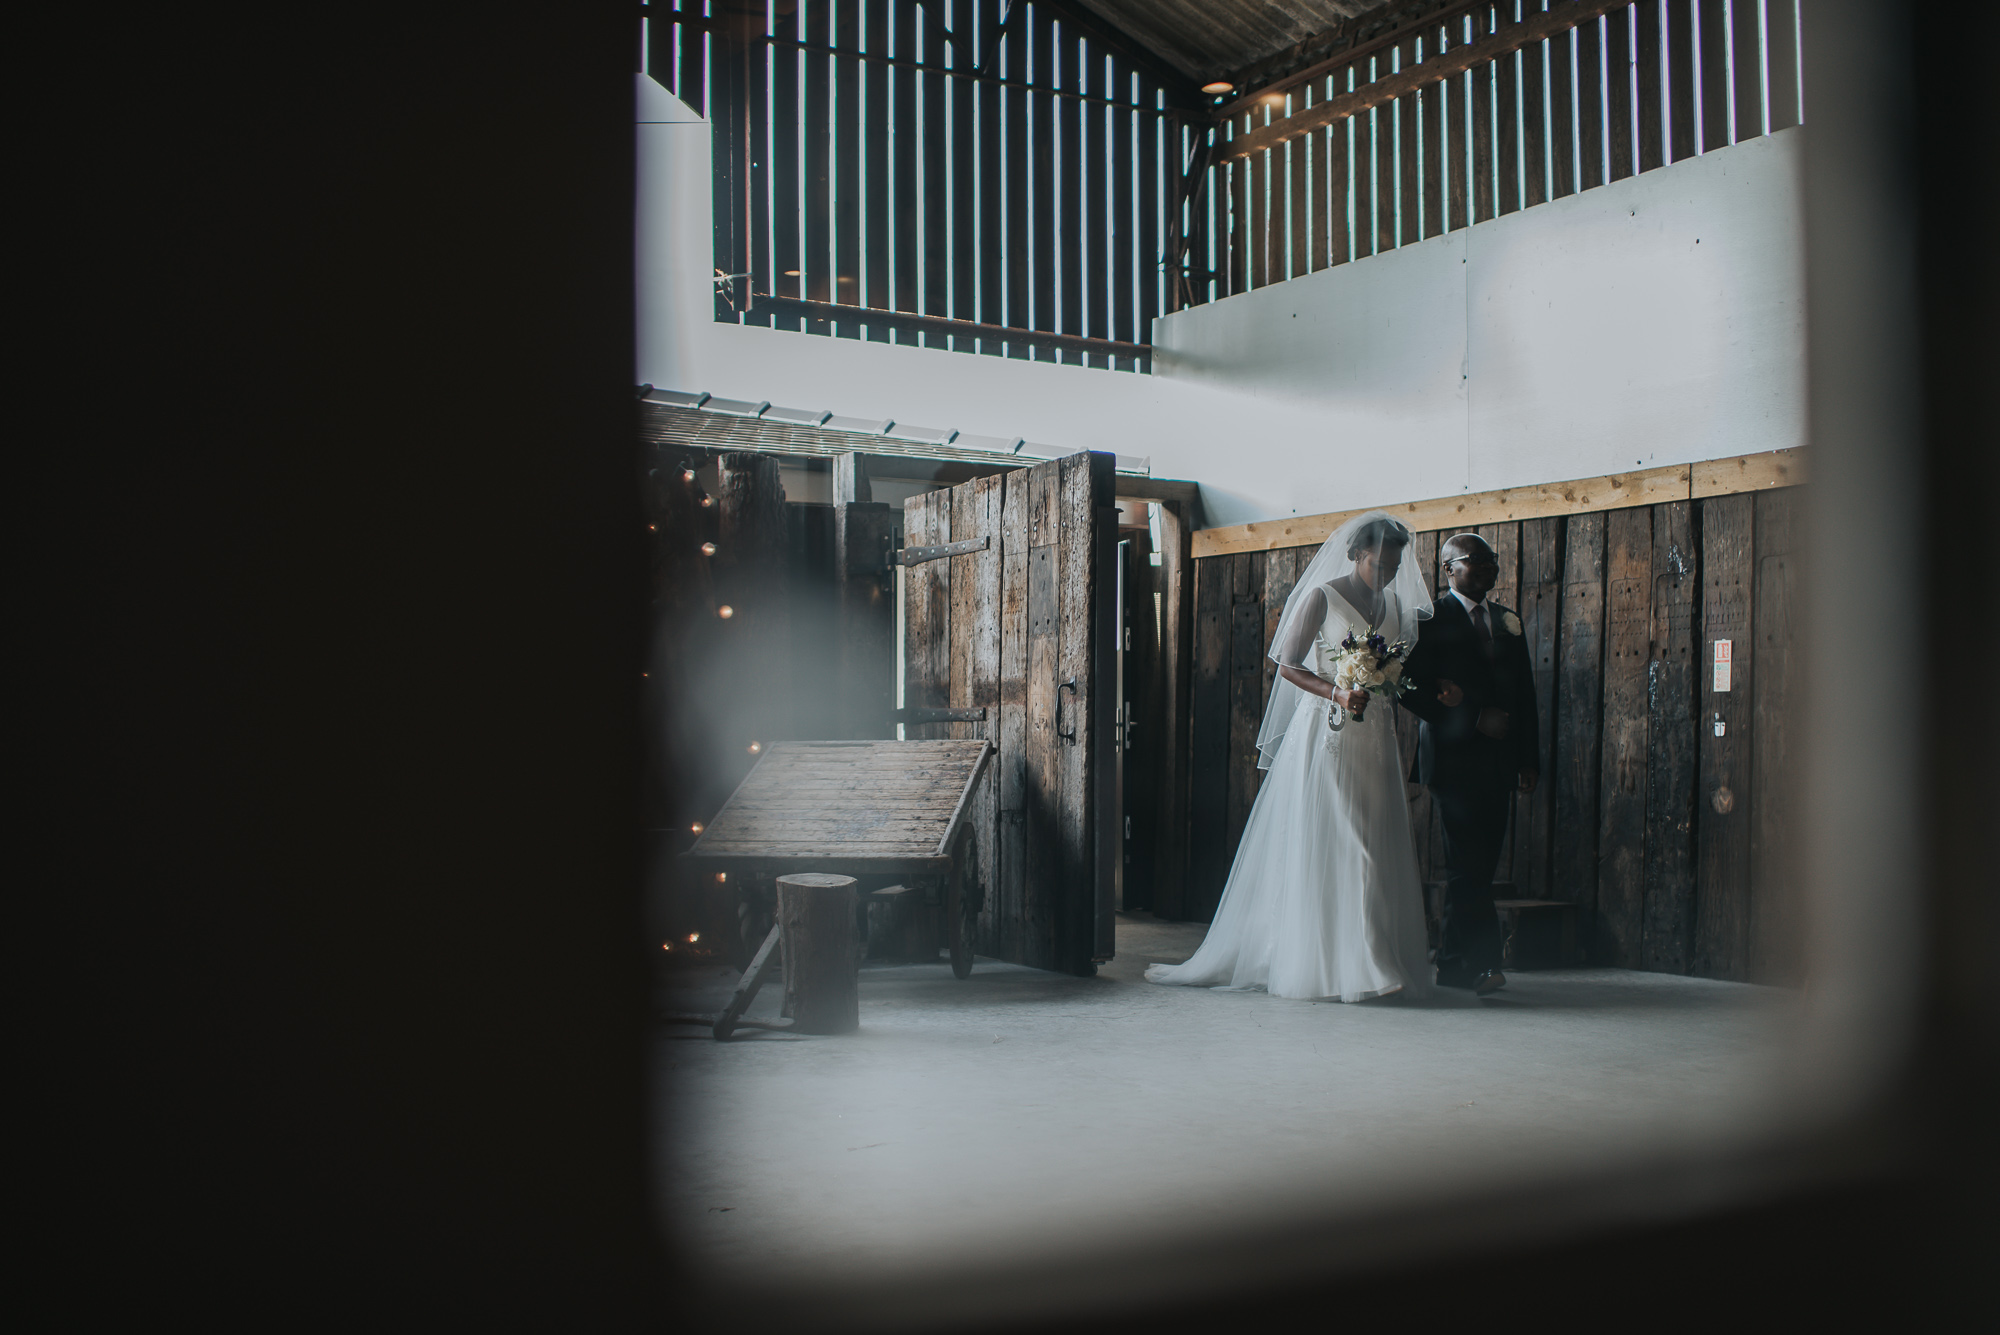 Owen HOuse Wedding Barn WEdding Photographer cheshire adam joe roberts photography (12 of 36).jpg